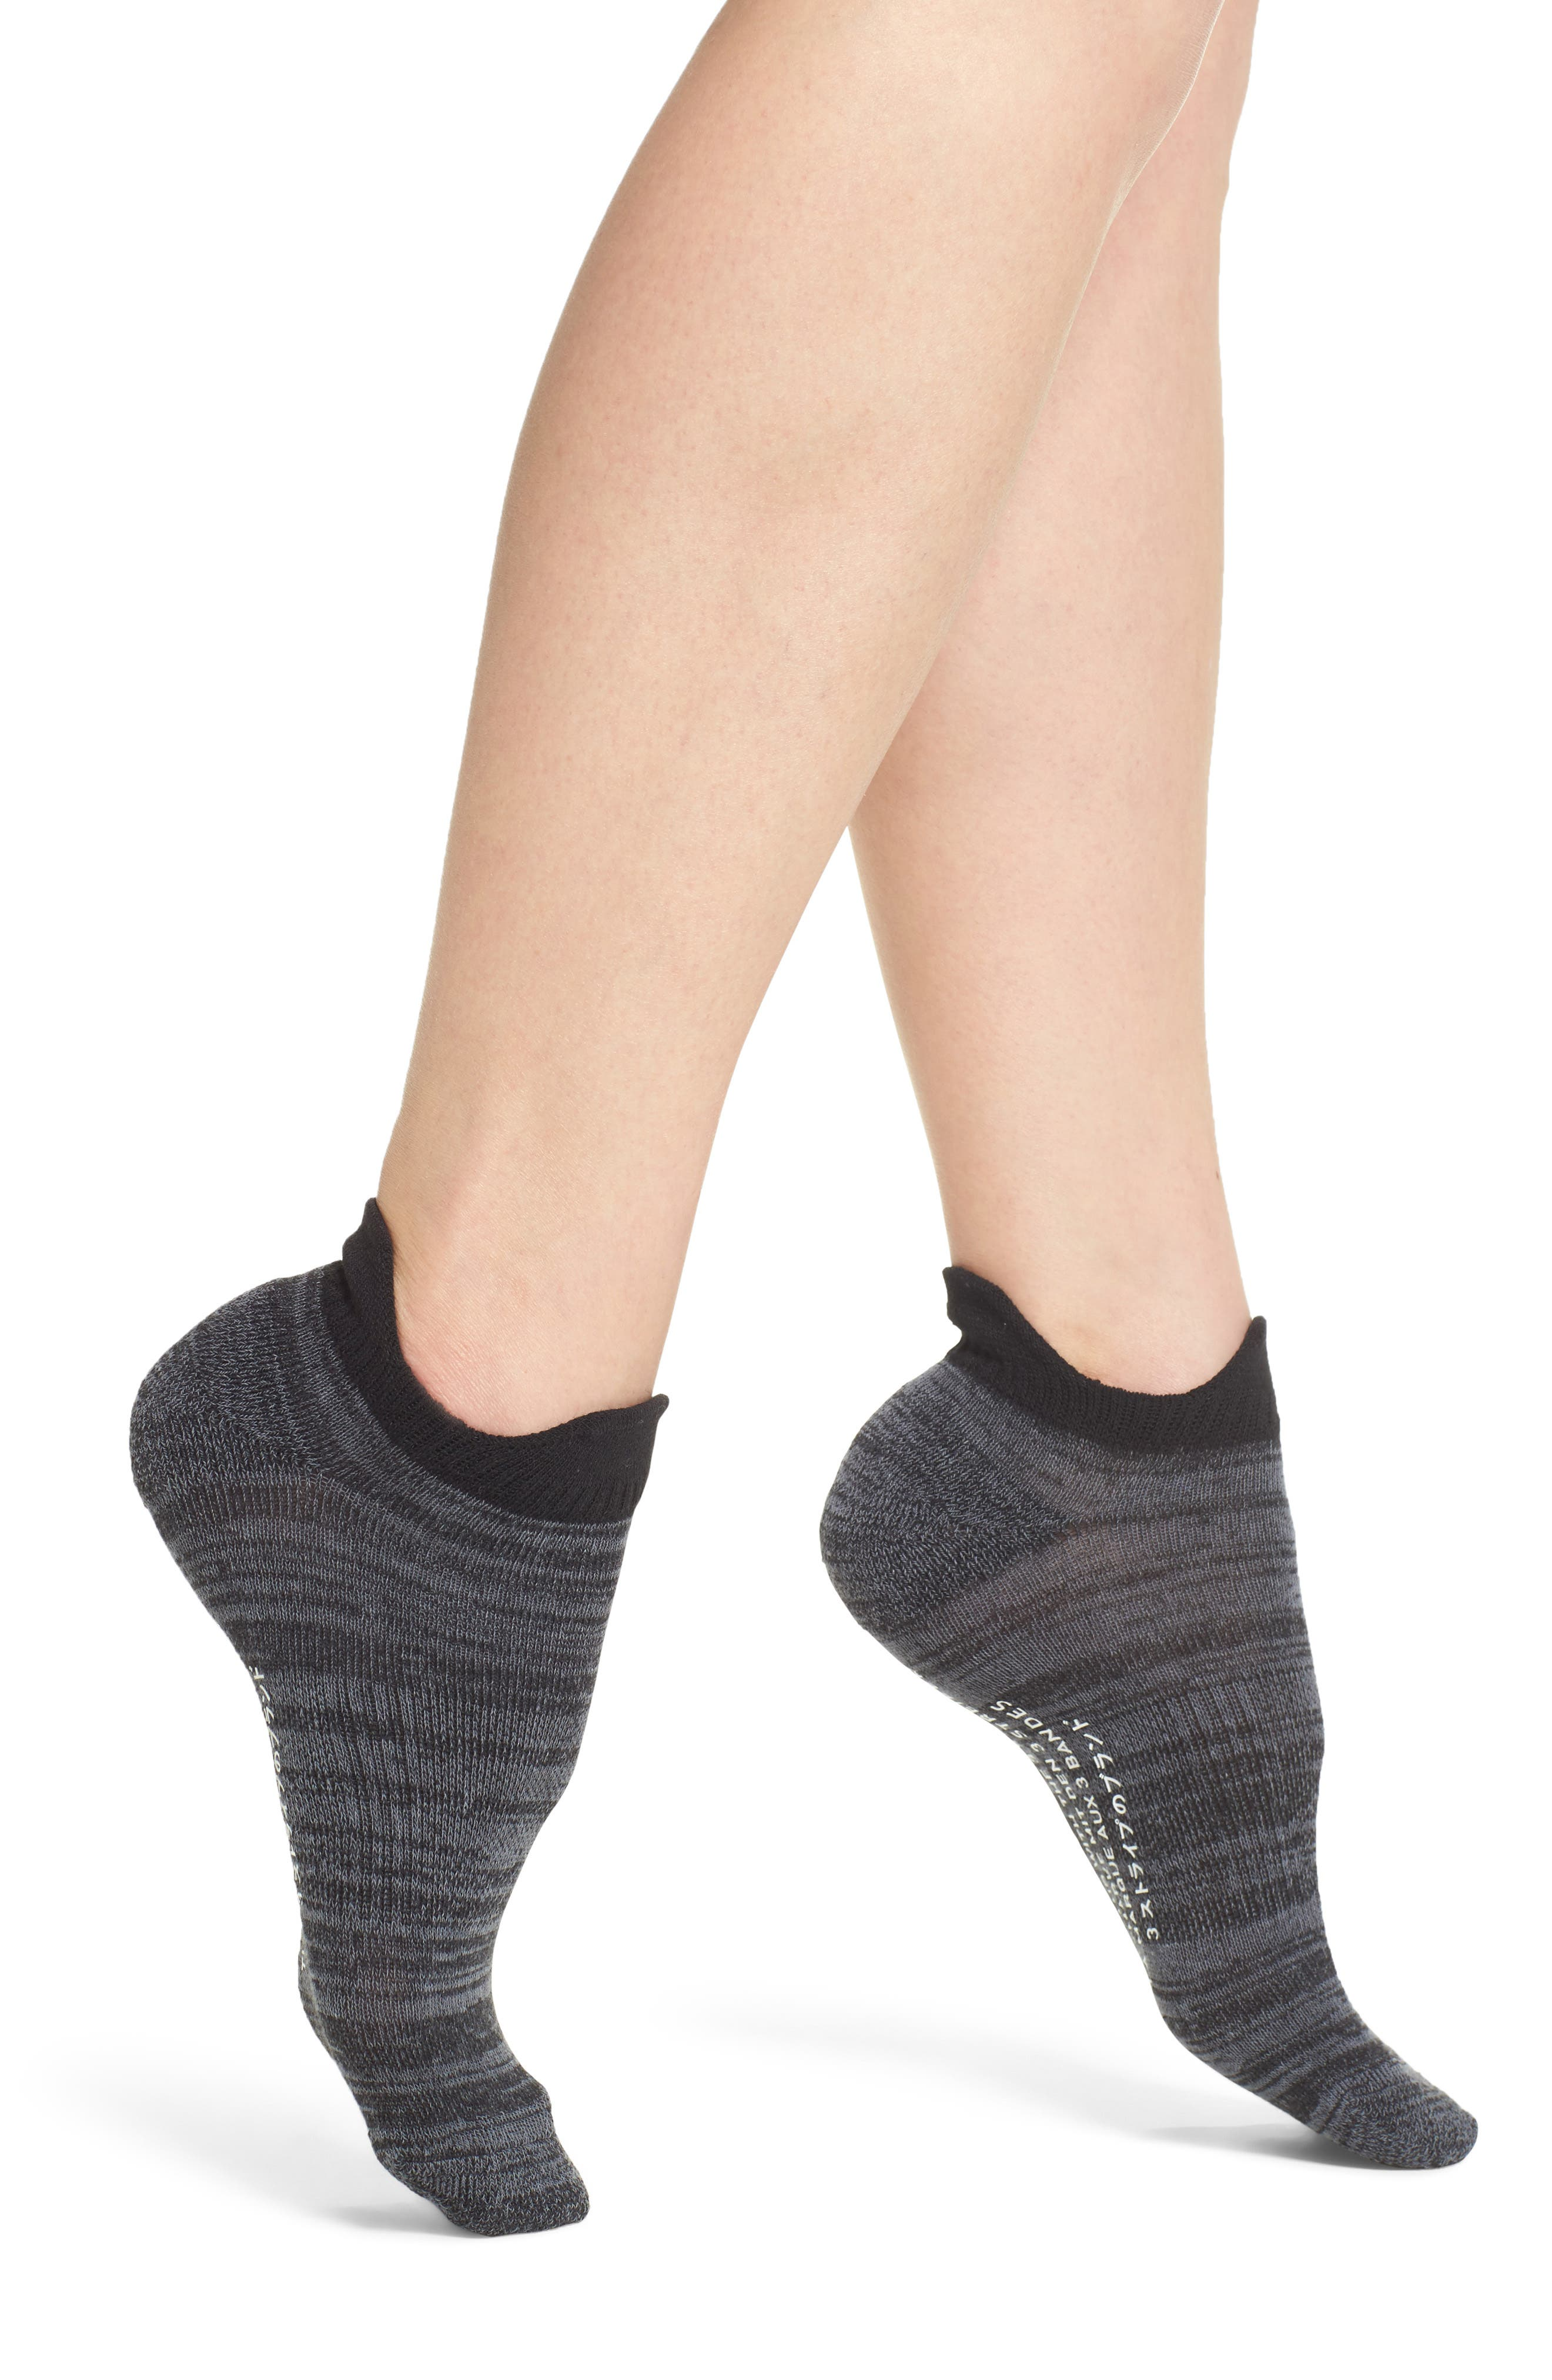 adidas Original NMD Footie Socks